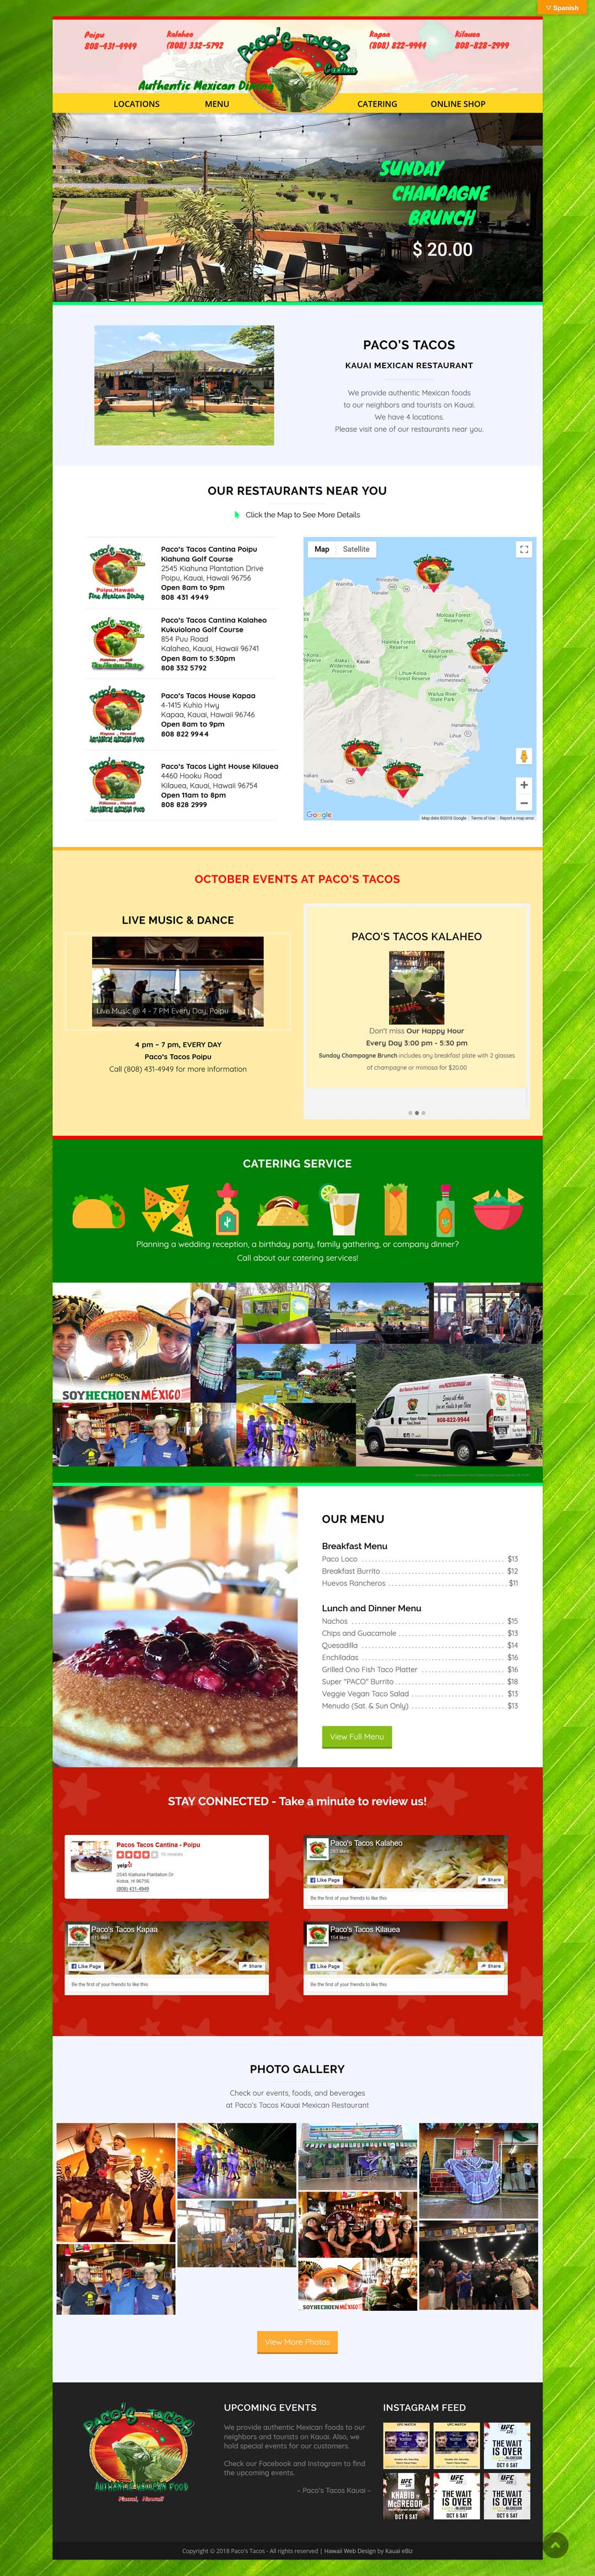 Online Shop Web Design Hawaii